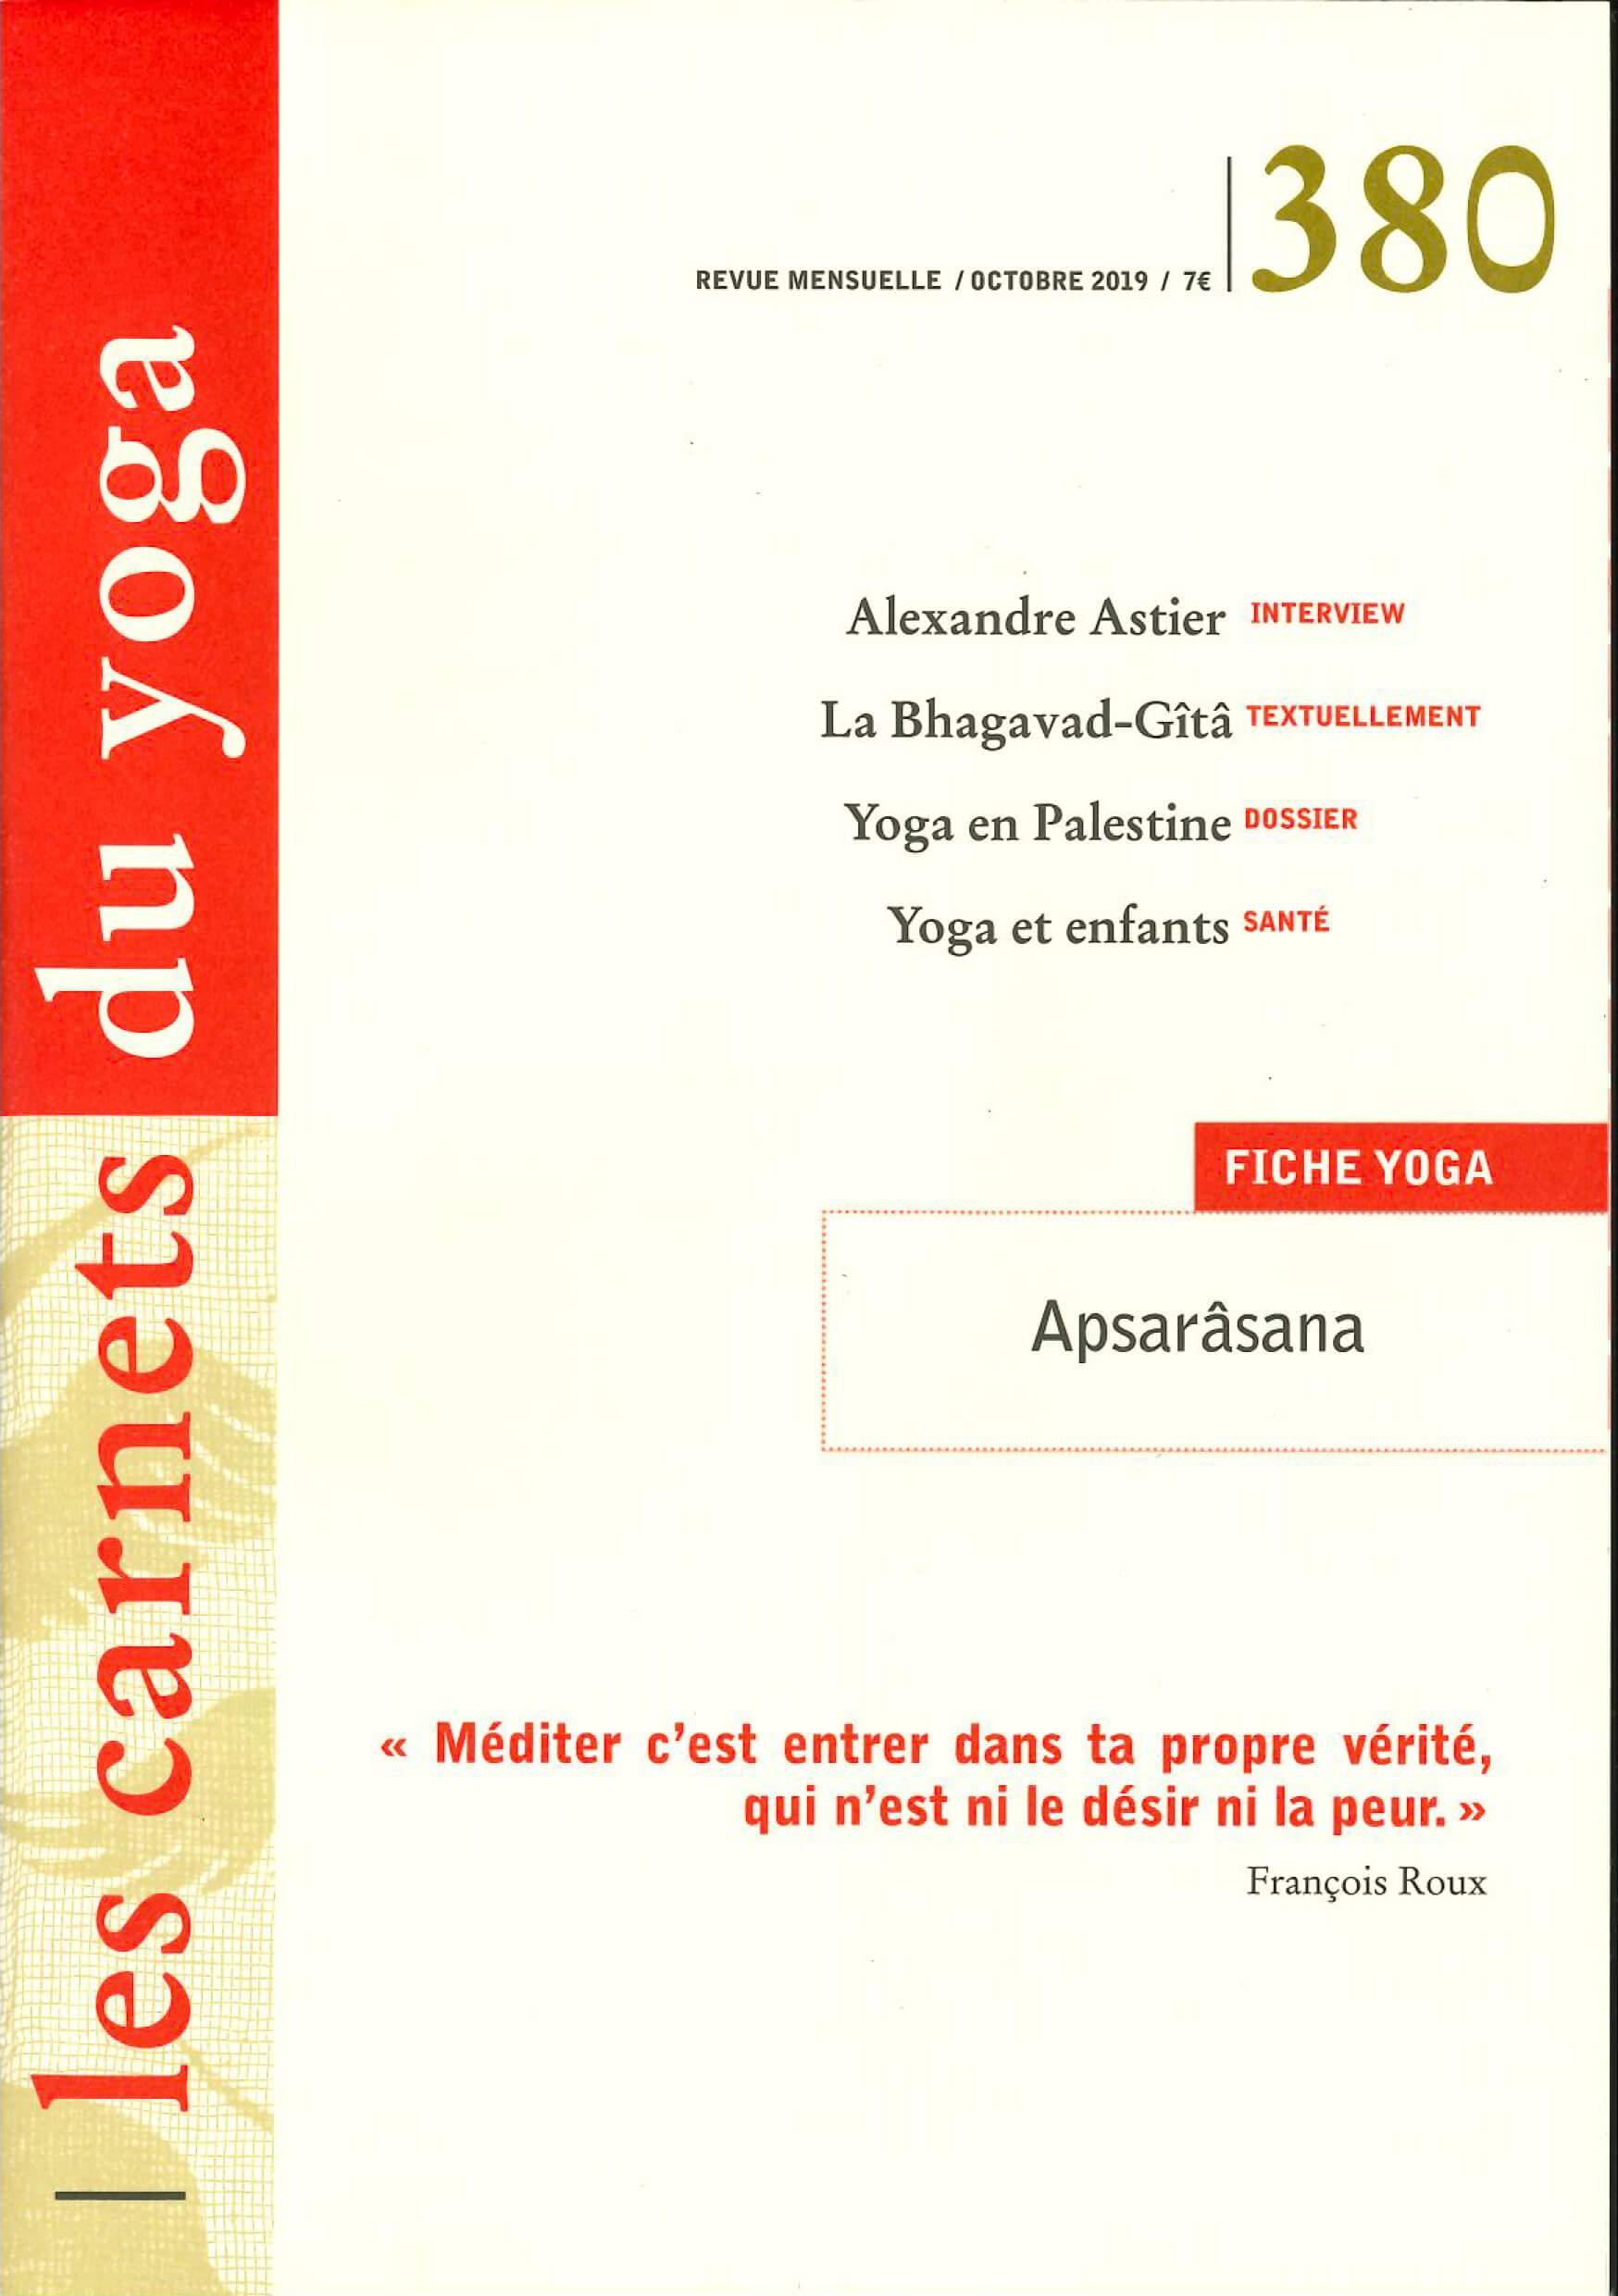 Carnets du Yoga FNEY